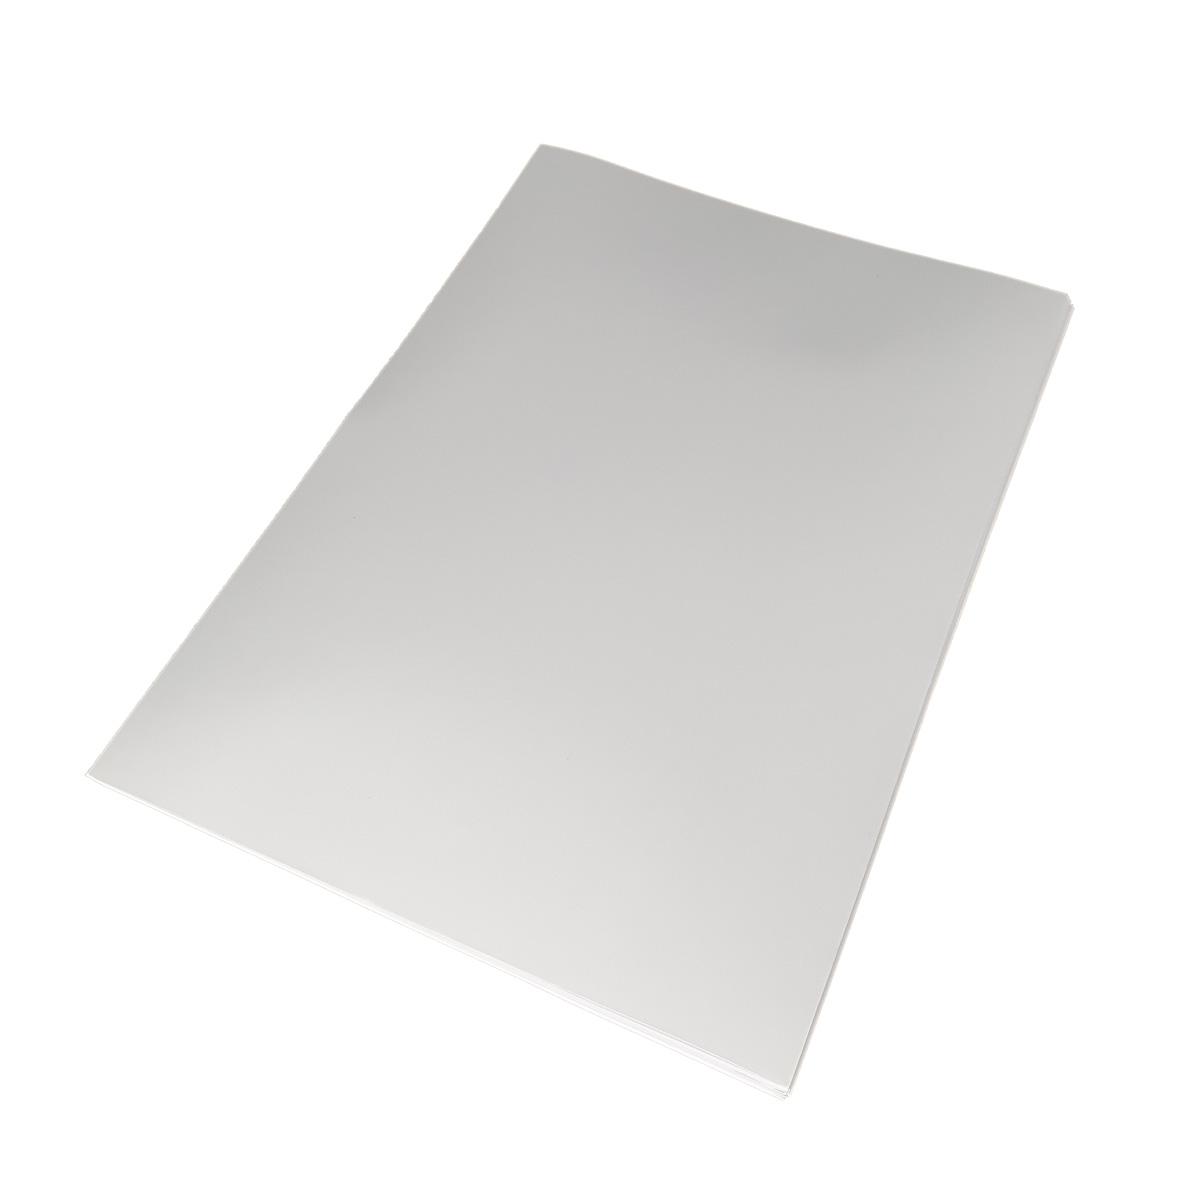 Papel Fotográfico Glossy A4 230g Resistente a Água 20fls High Evolut